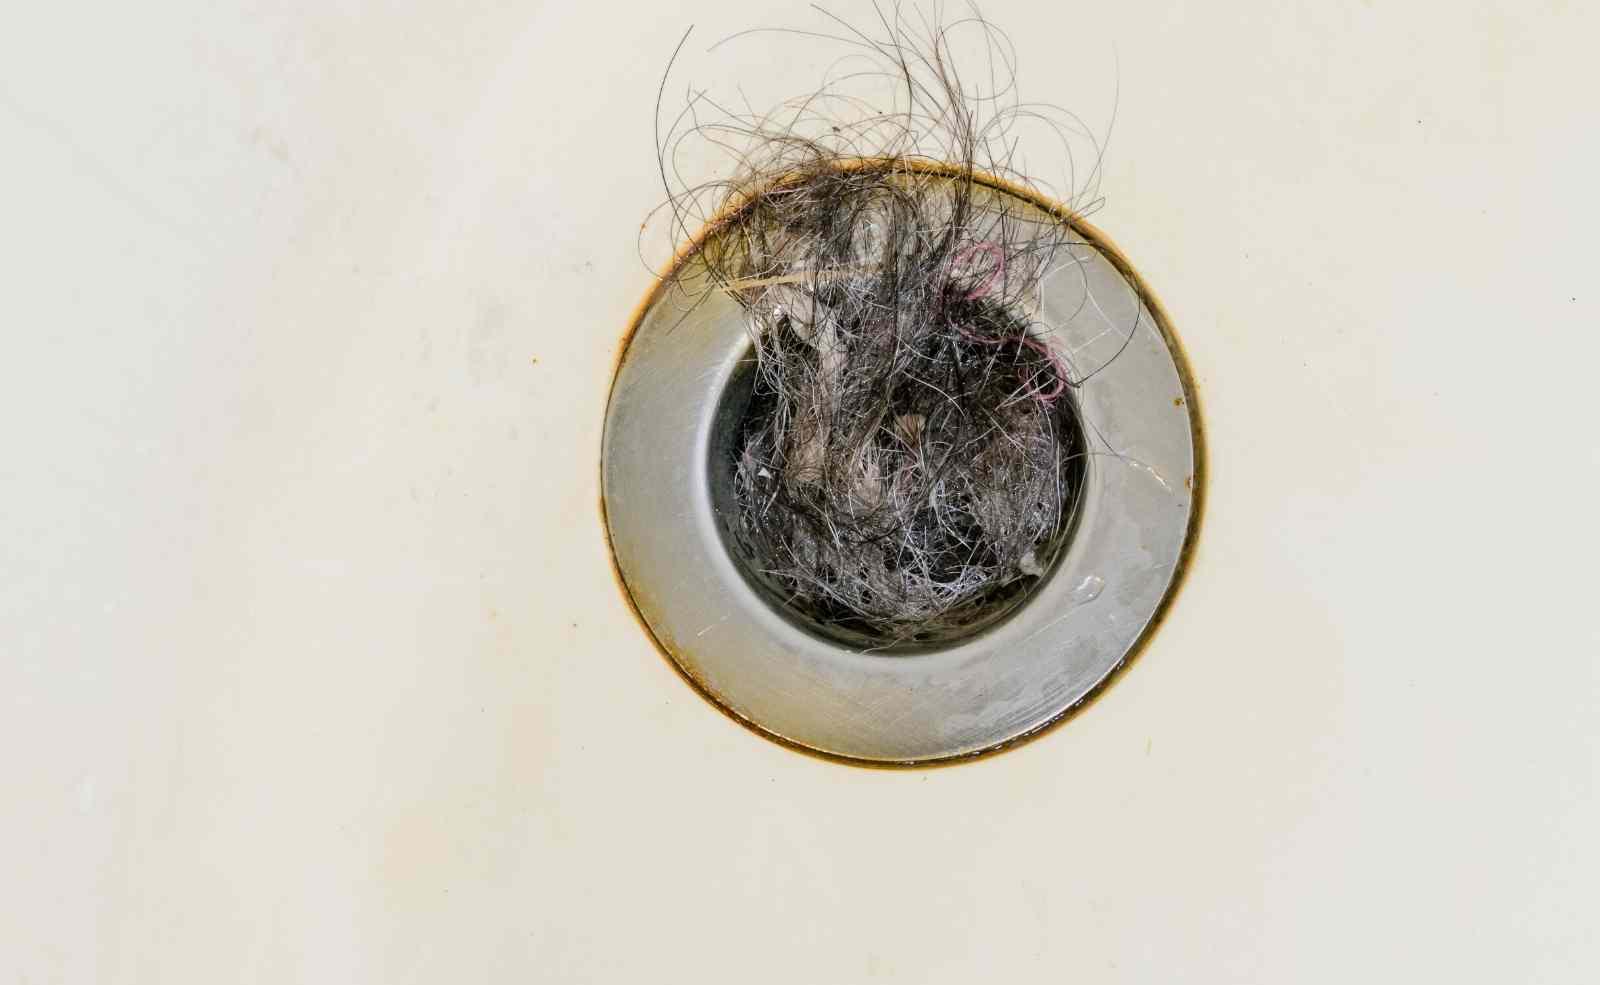 Haare aus Bad Abfluss entfernen